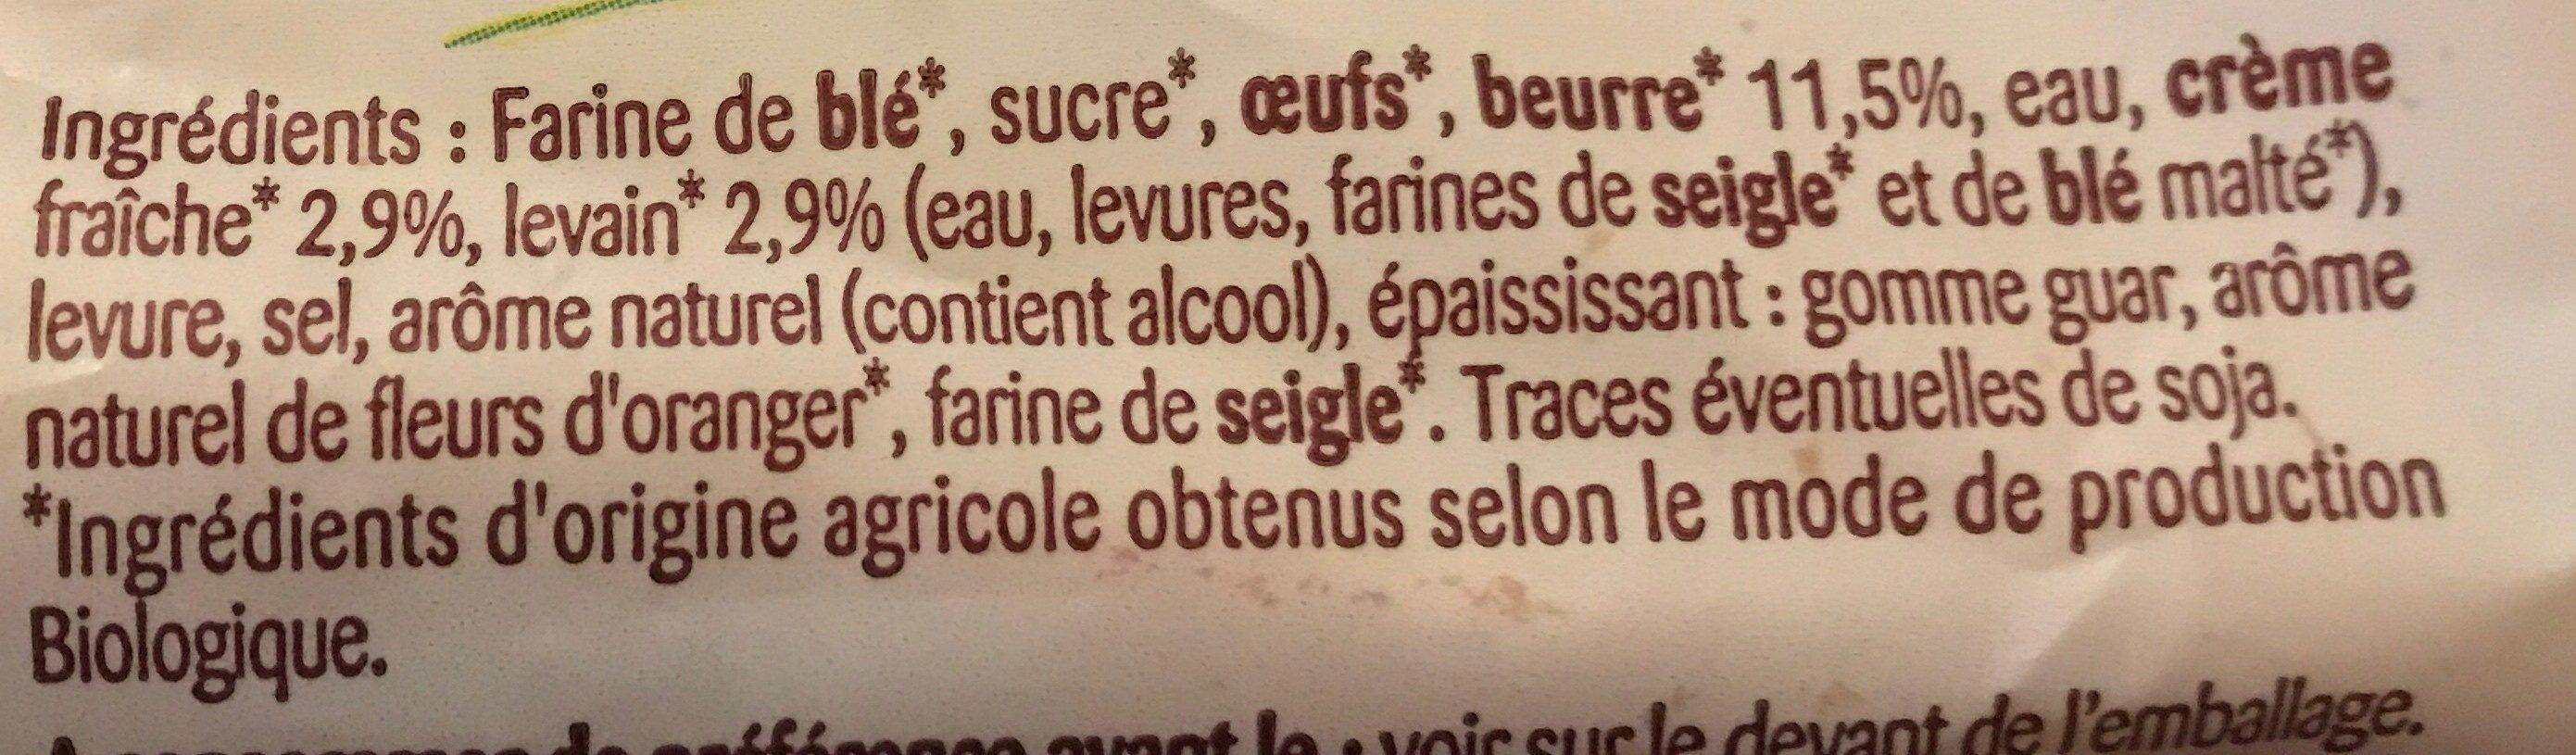 Gache tranchée bio - Ingredientes - fr